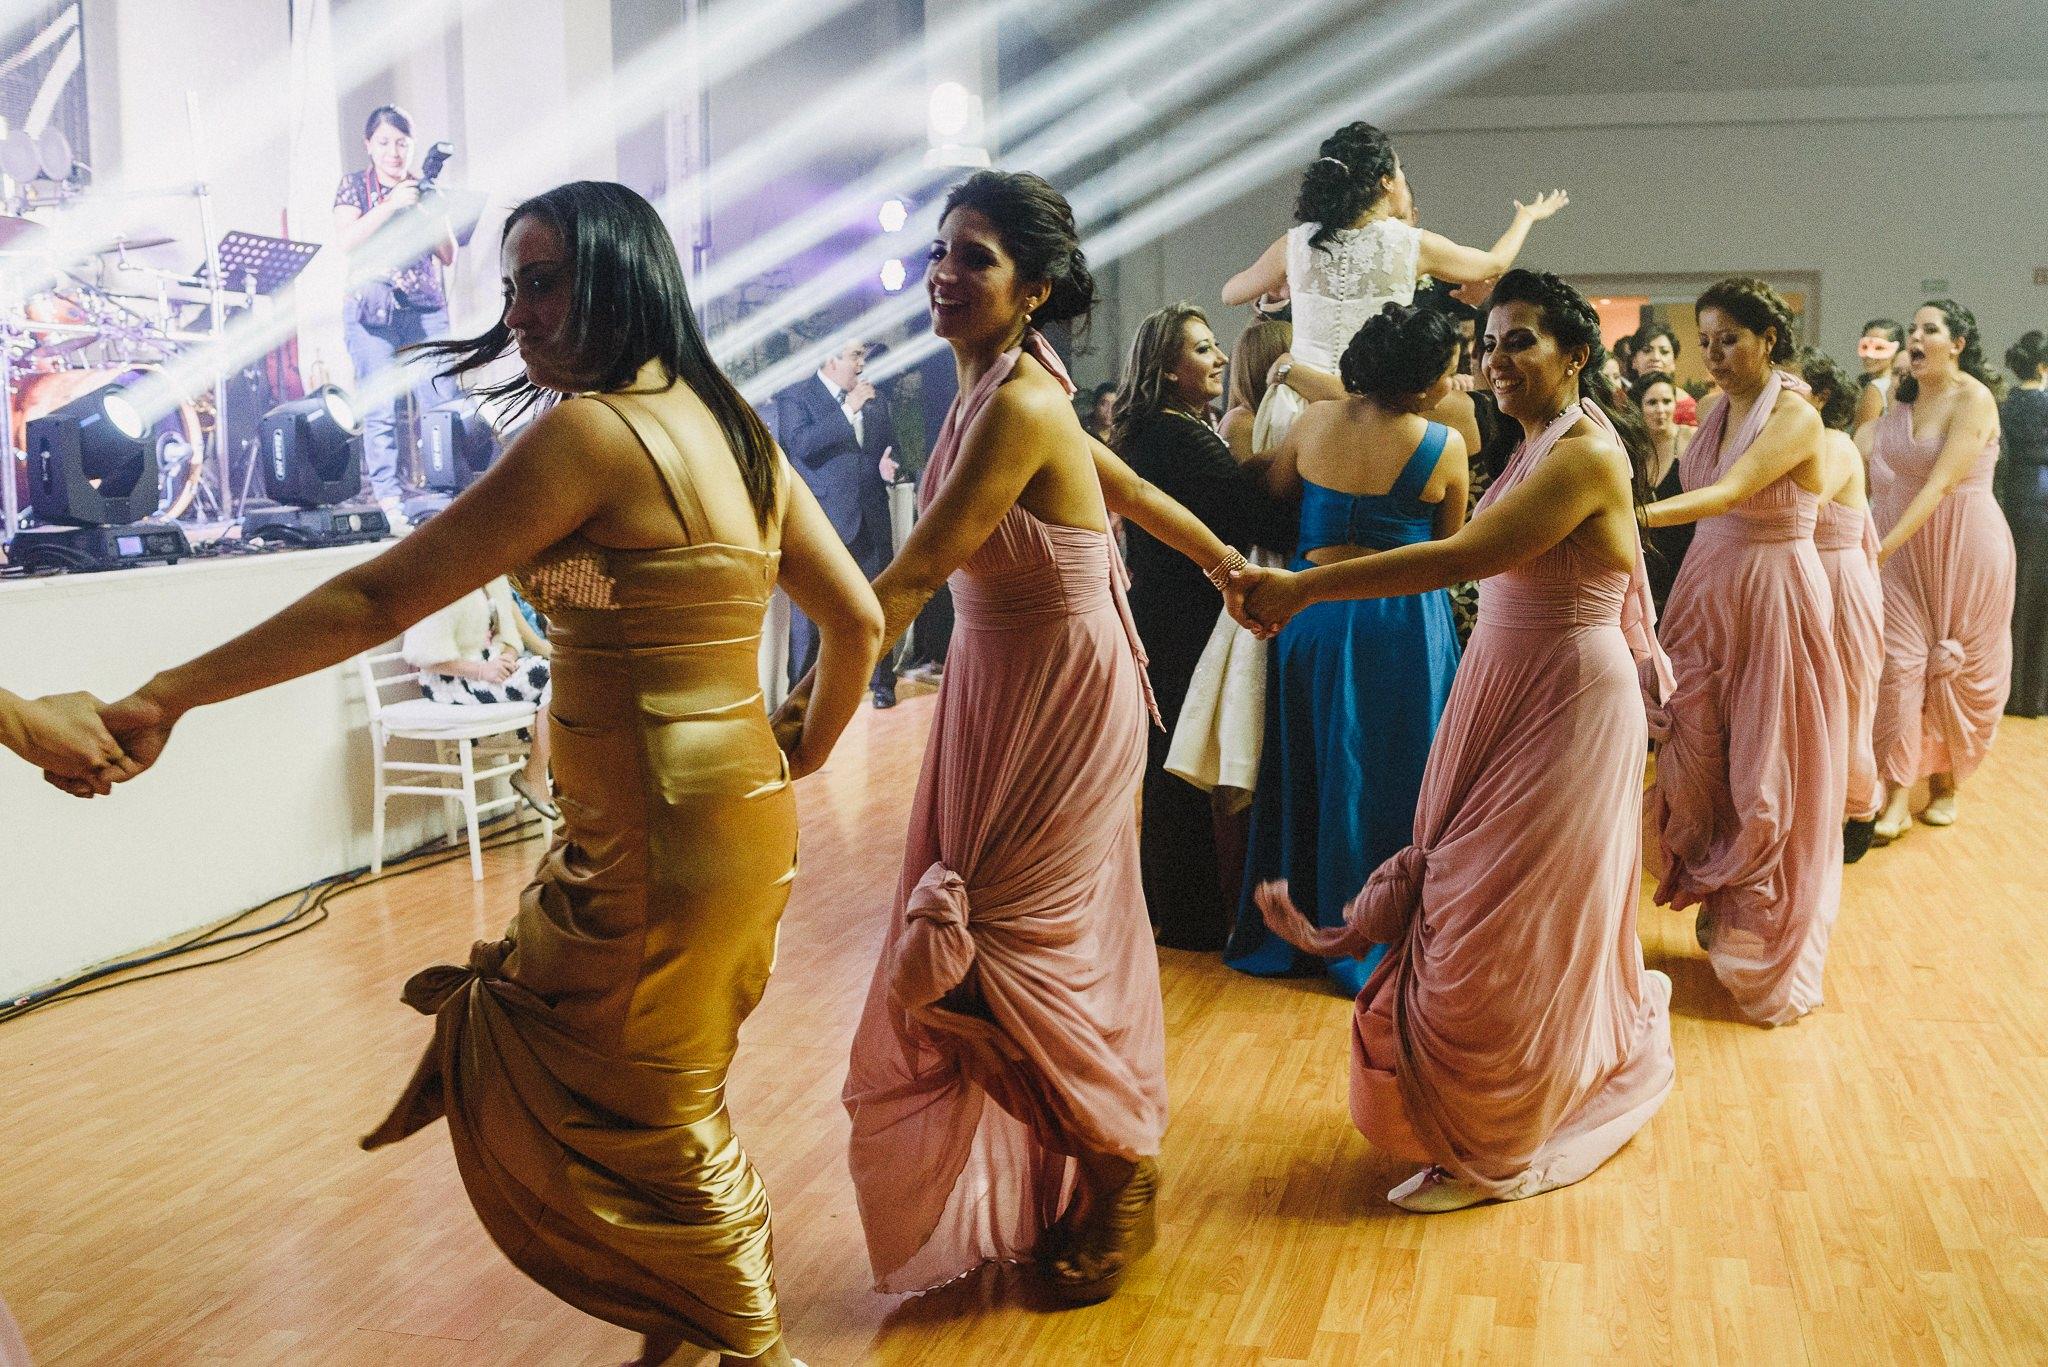 Wedding-Boda-Tulancingo-Hidalgo-Salon-Essenzia-Luis-Houdin-61-film